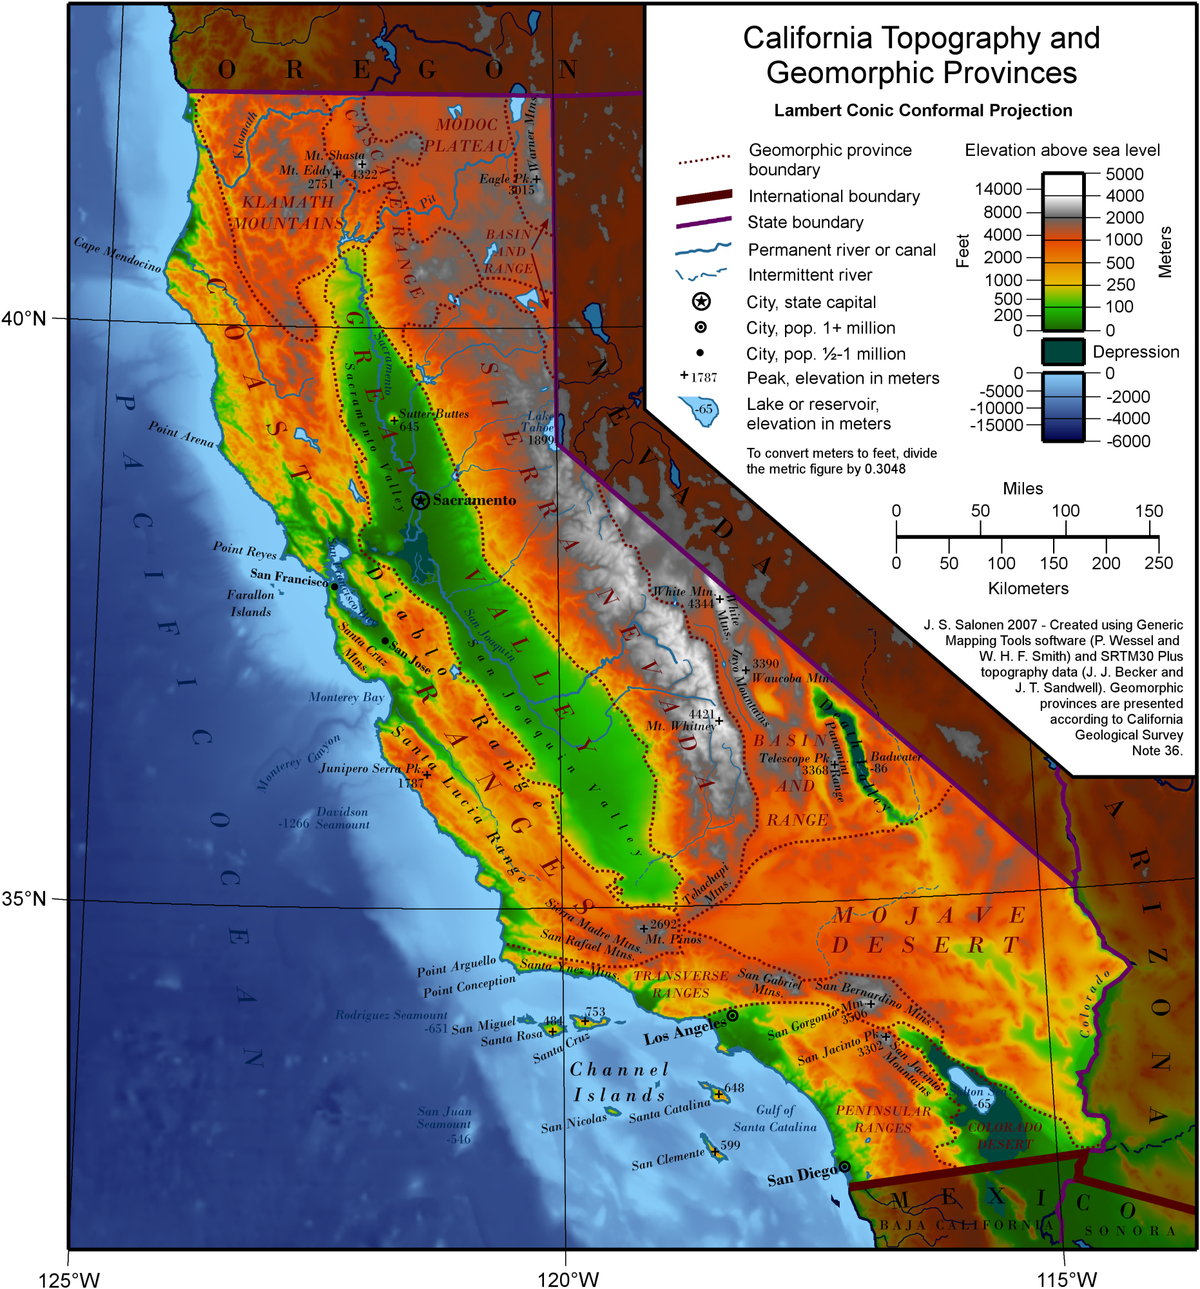 Geography Of California Google Maps California Southern California - Topo Map Of California